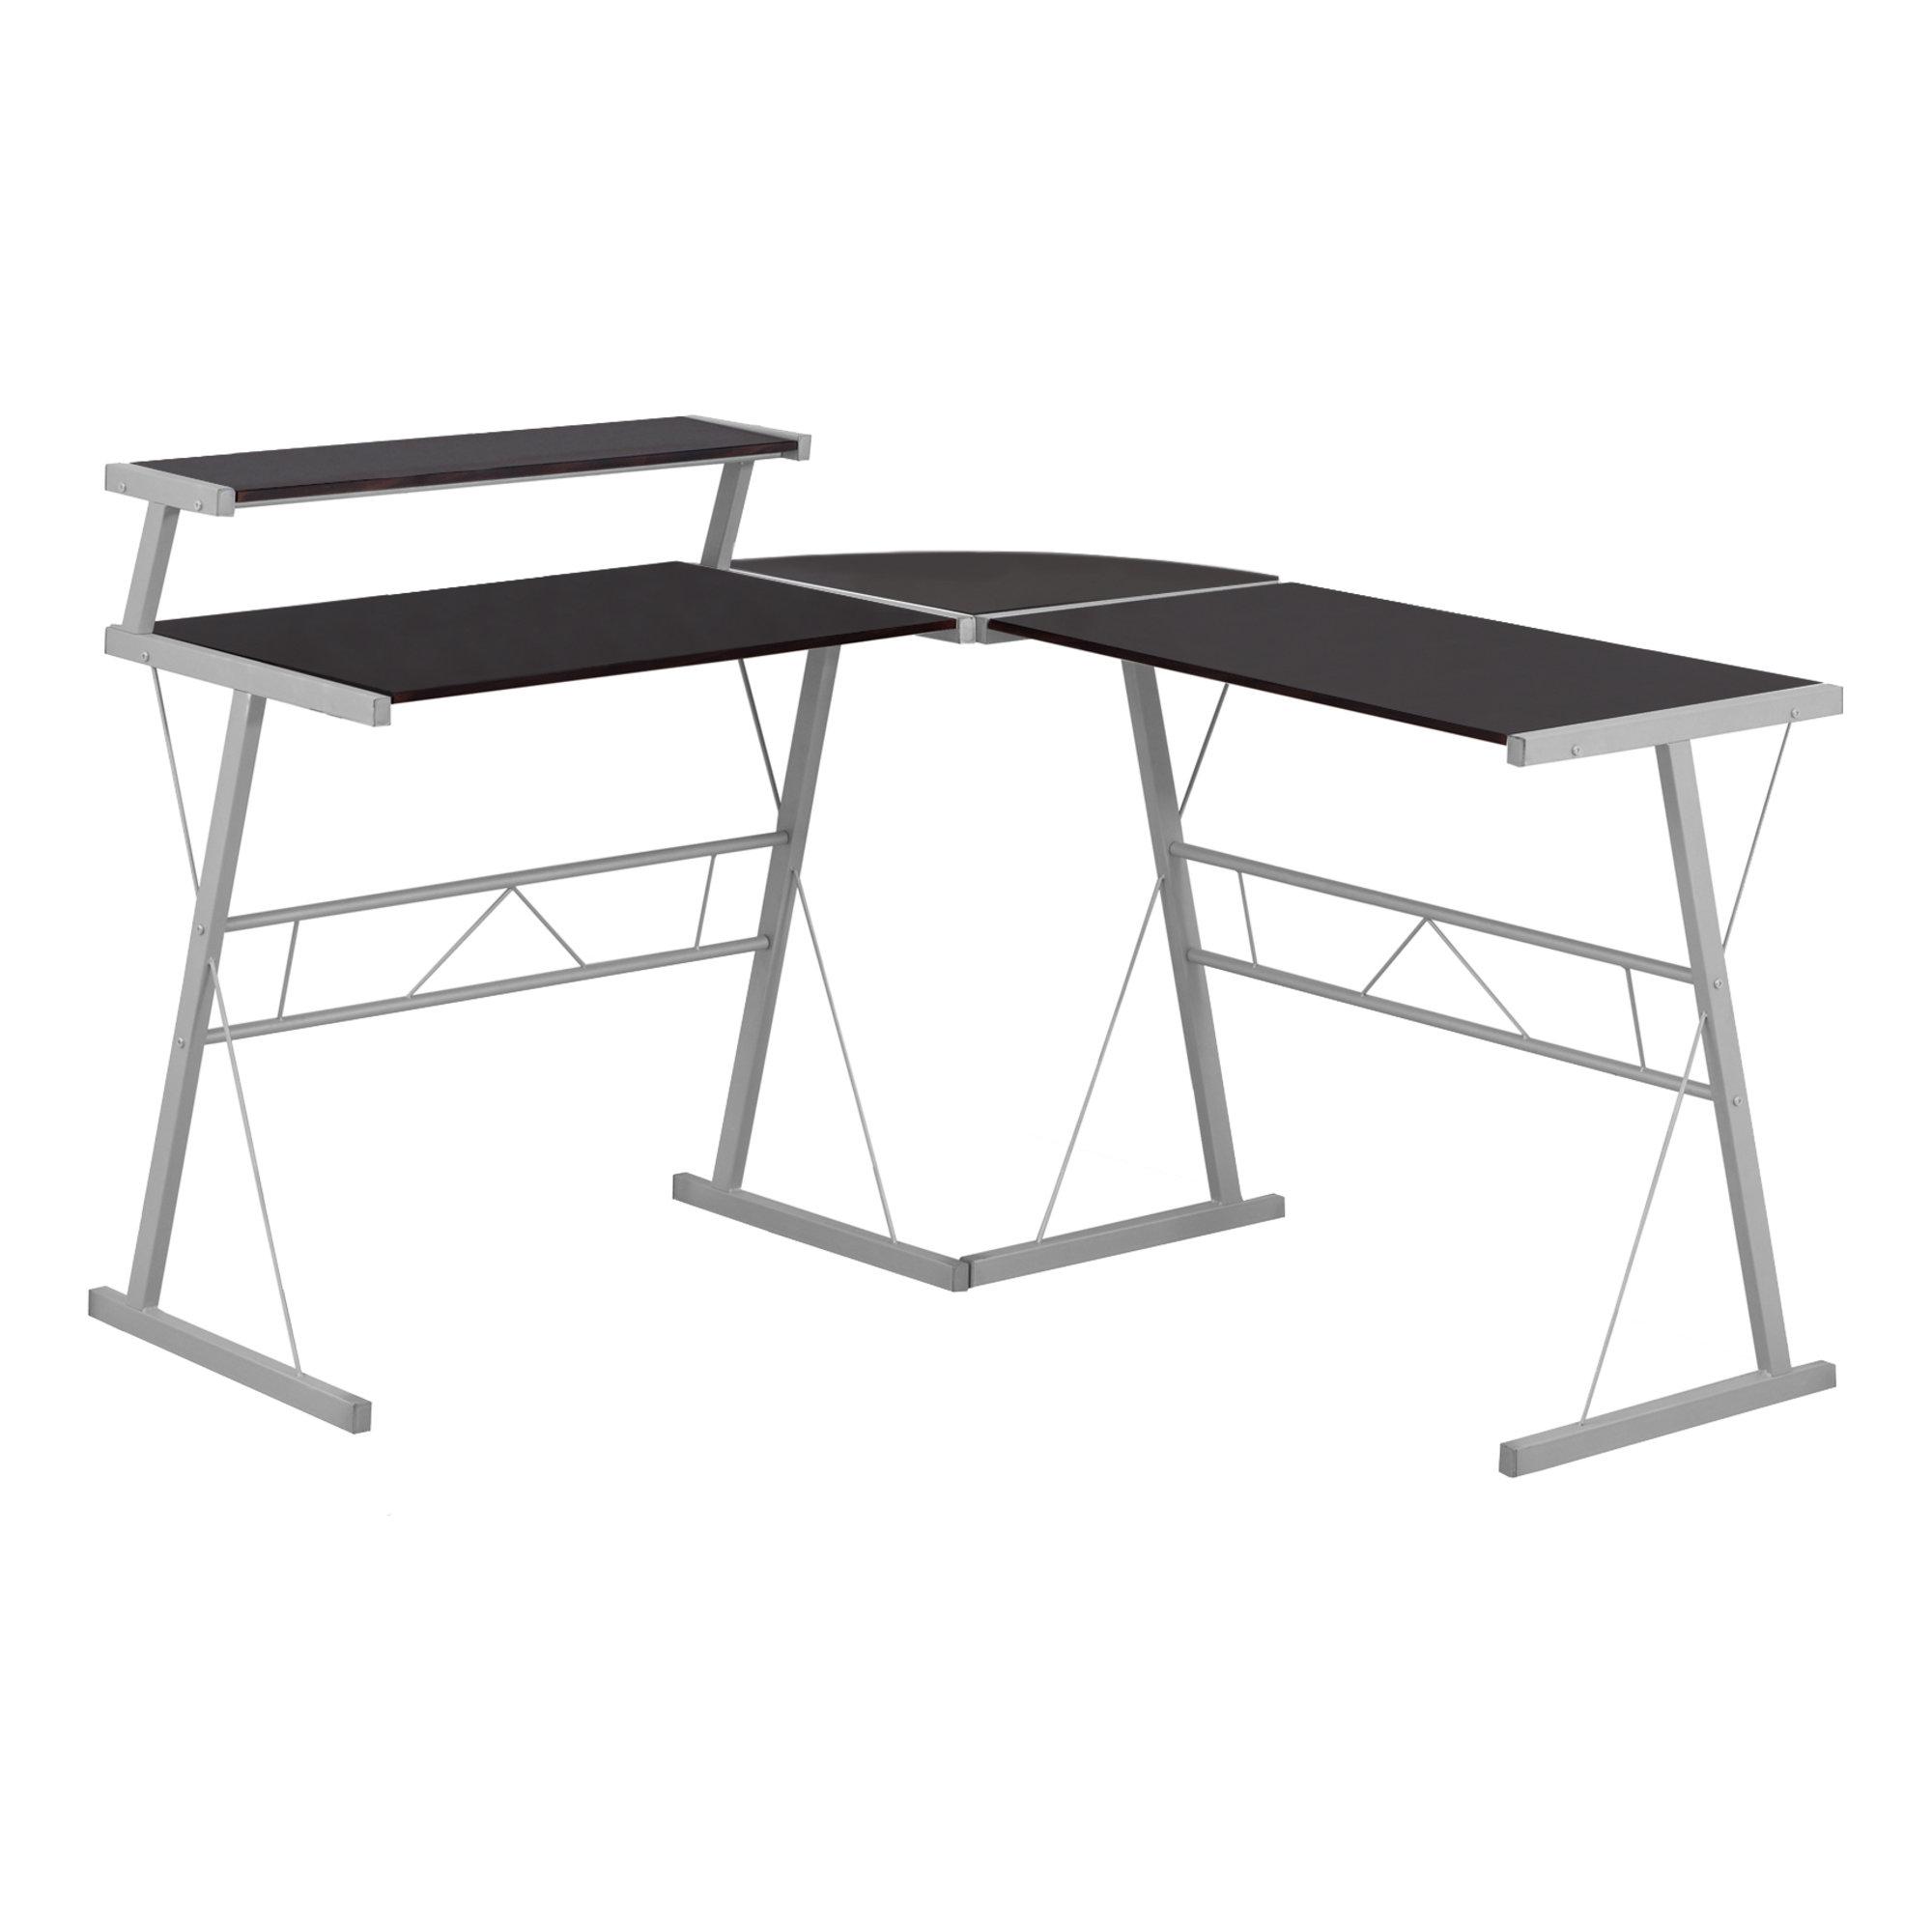 "18.25"" x 48.25"" x 36.75"" Cappuccino Silver Metal  Computer Desk"